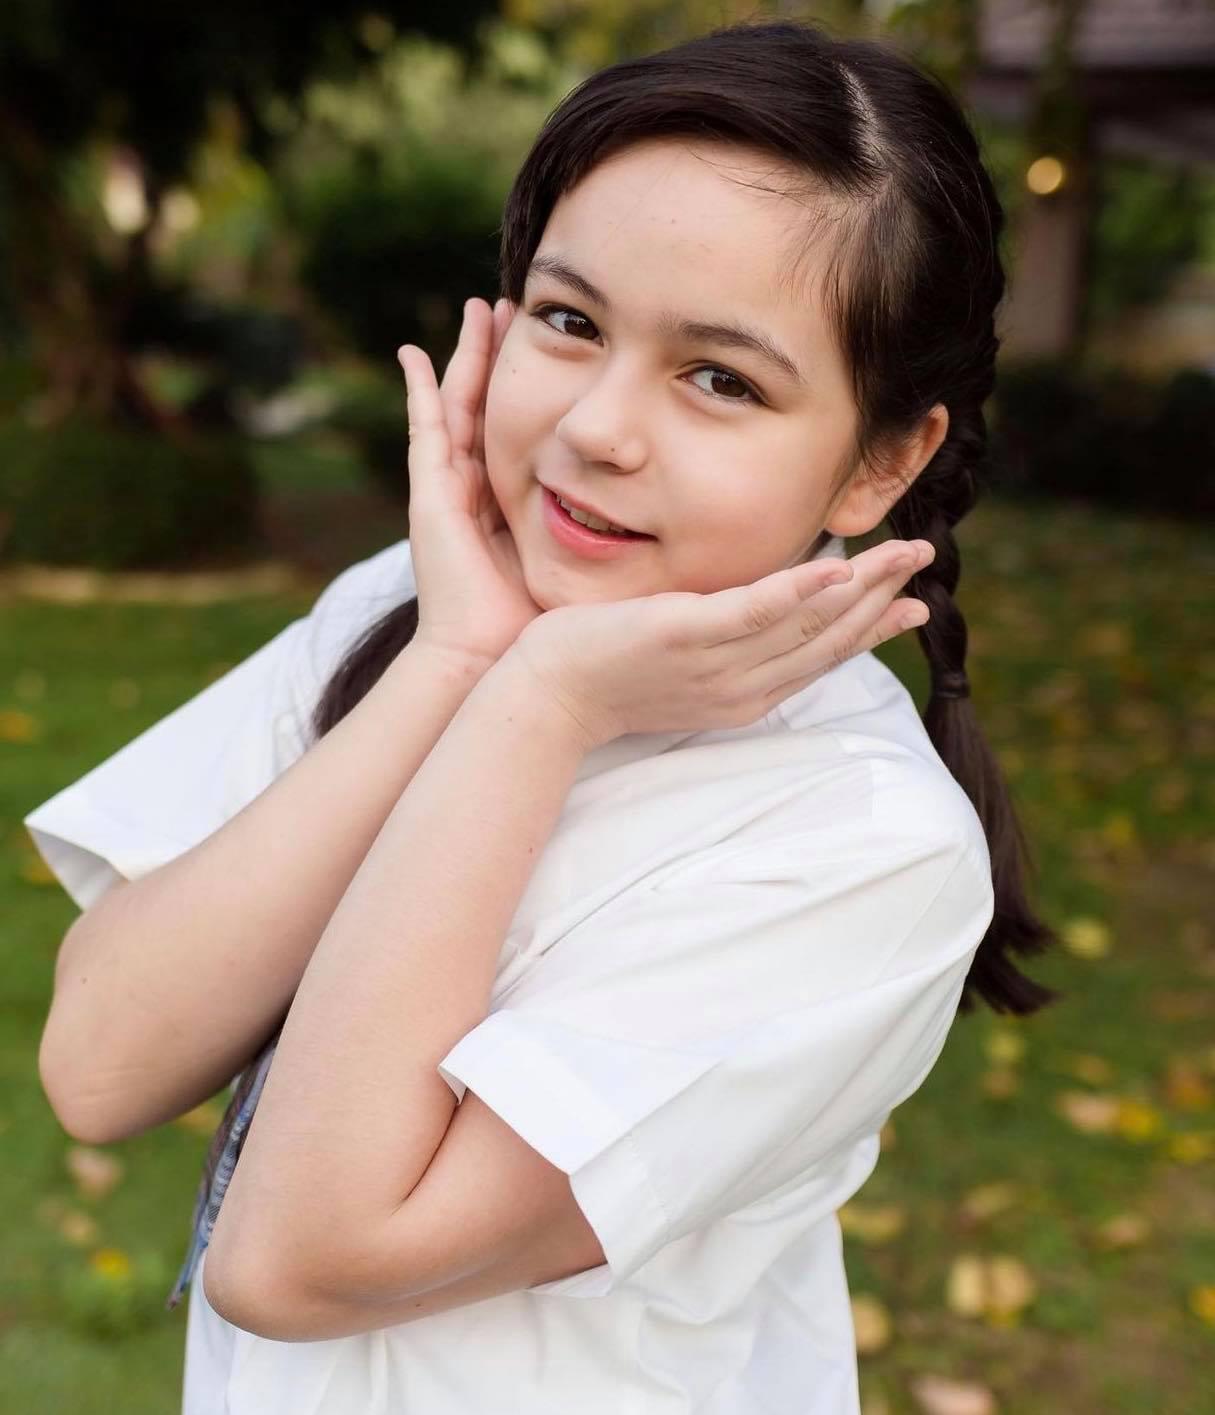 bat ngo voi dung mao hien tai cua thien than nhi duoc khen xinh nhat thai lan 7 nam truoc4